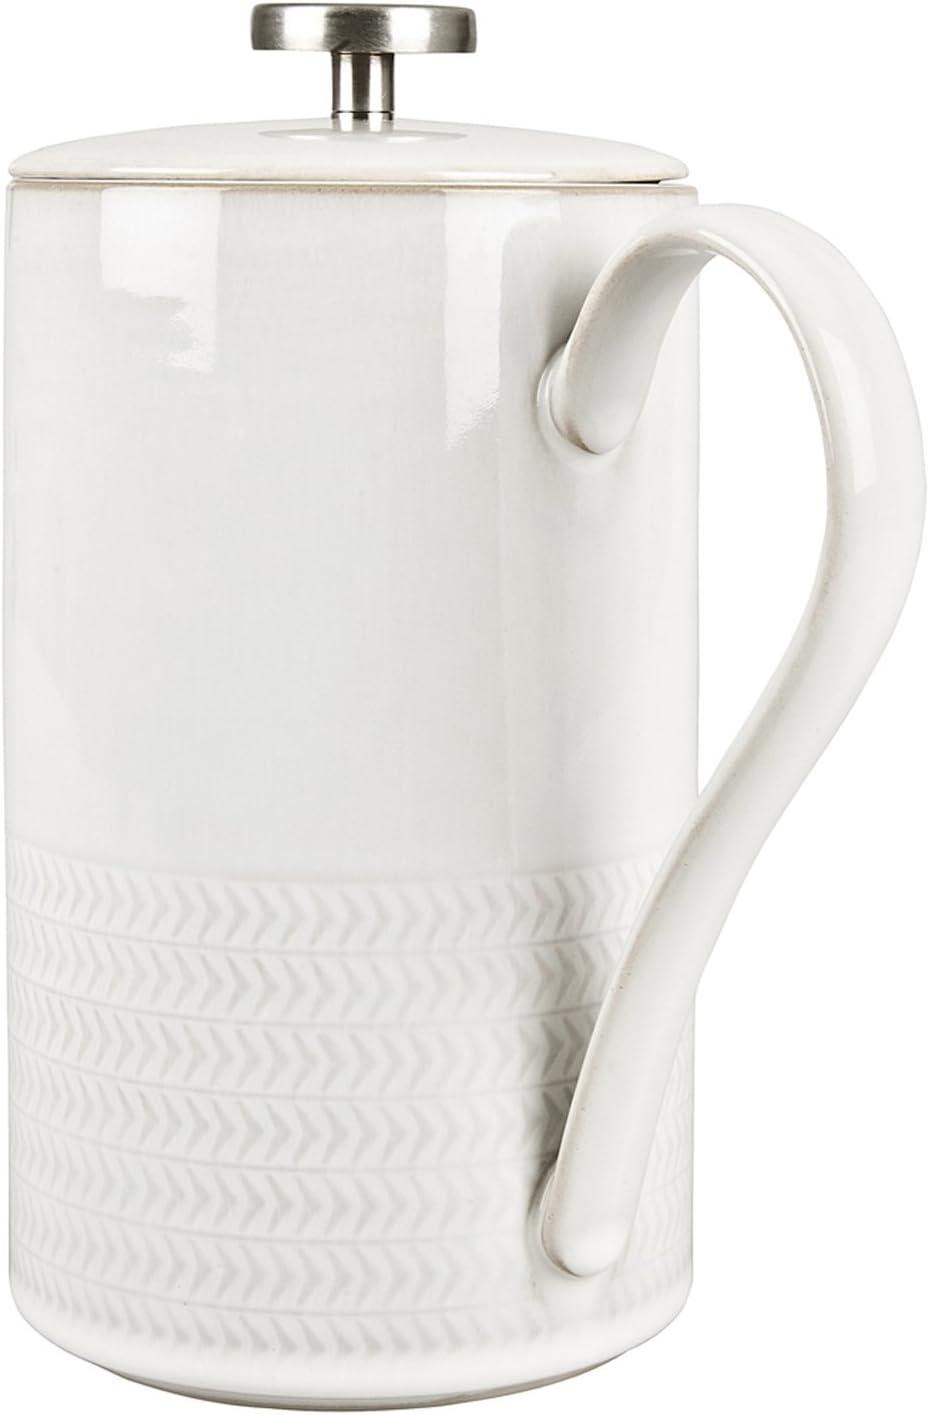 Amazon Com Denby Usa Natural Canvas Textured French Press Pasta Bowls